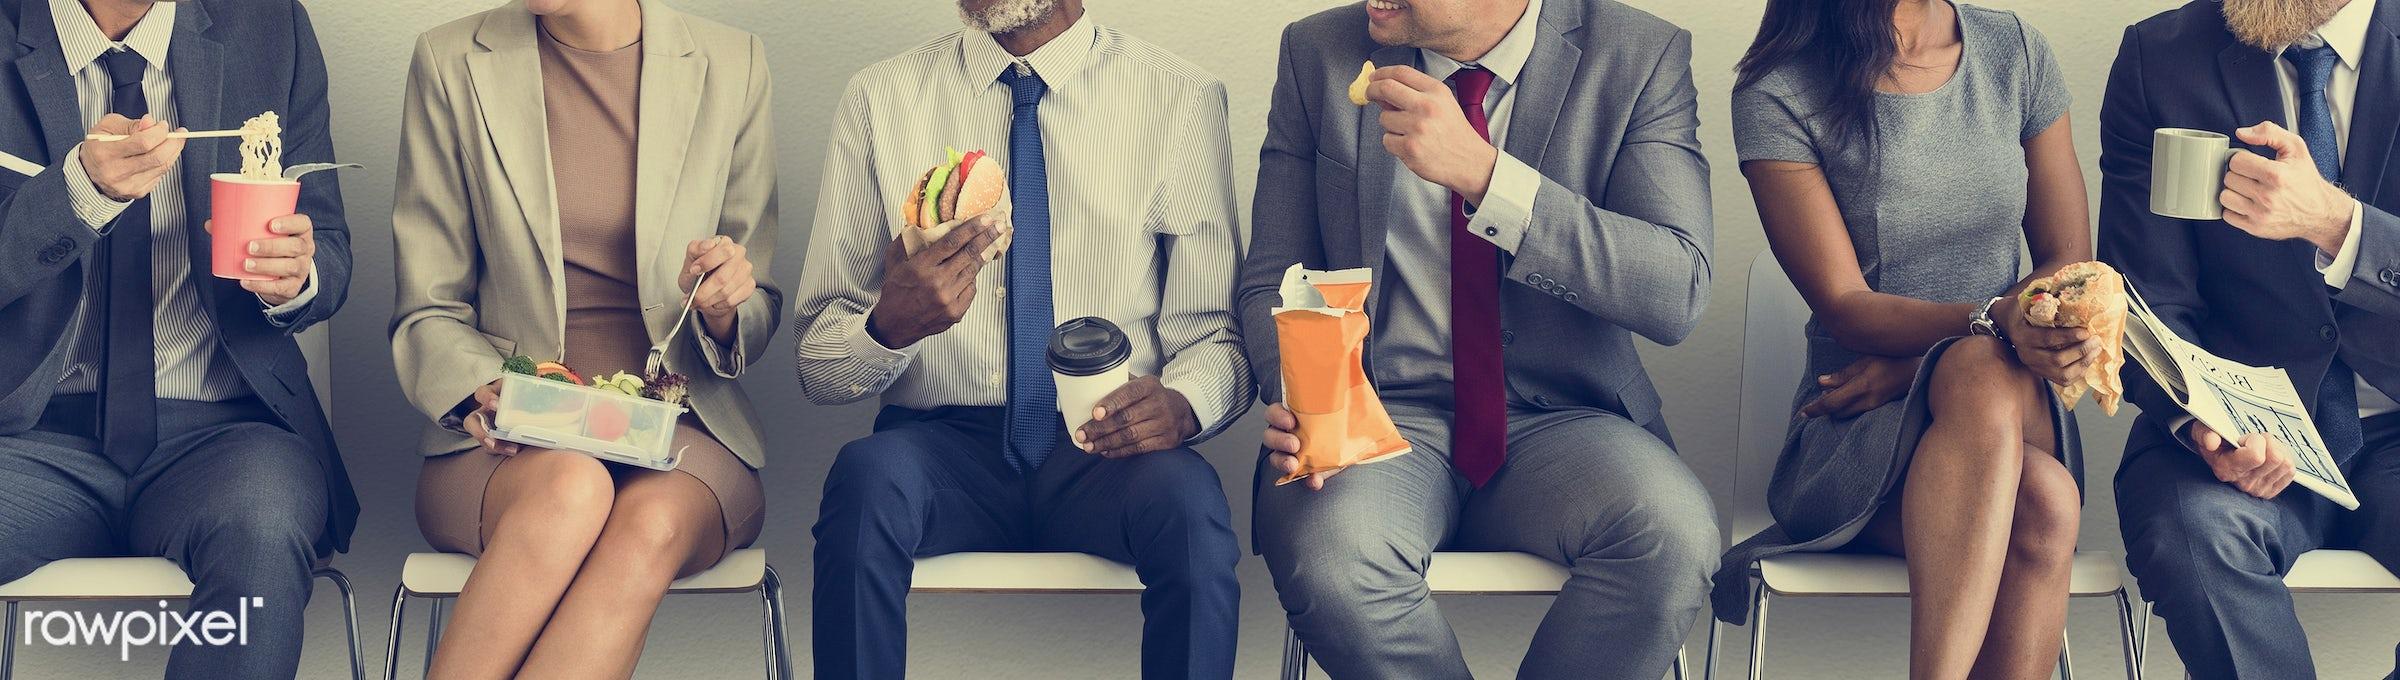 achievement, activity, african descent, bread, break, breakfast, brunch, burger, business, chip, discussion, diverse,...